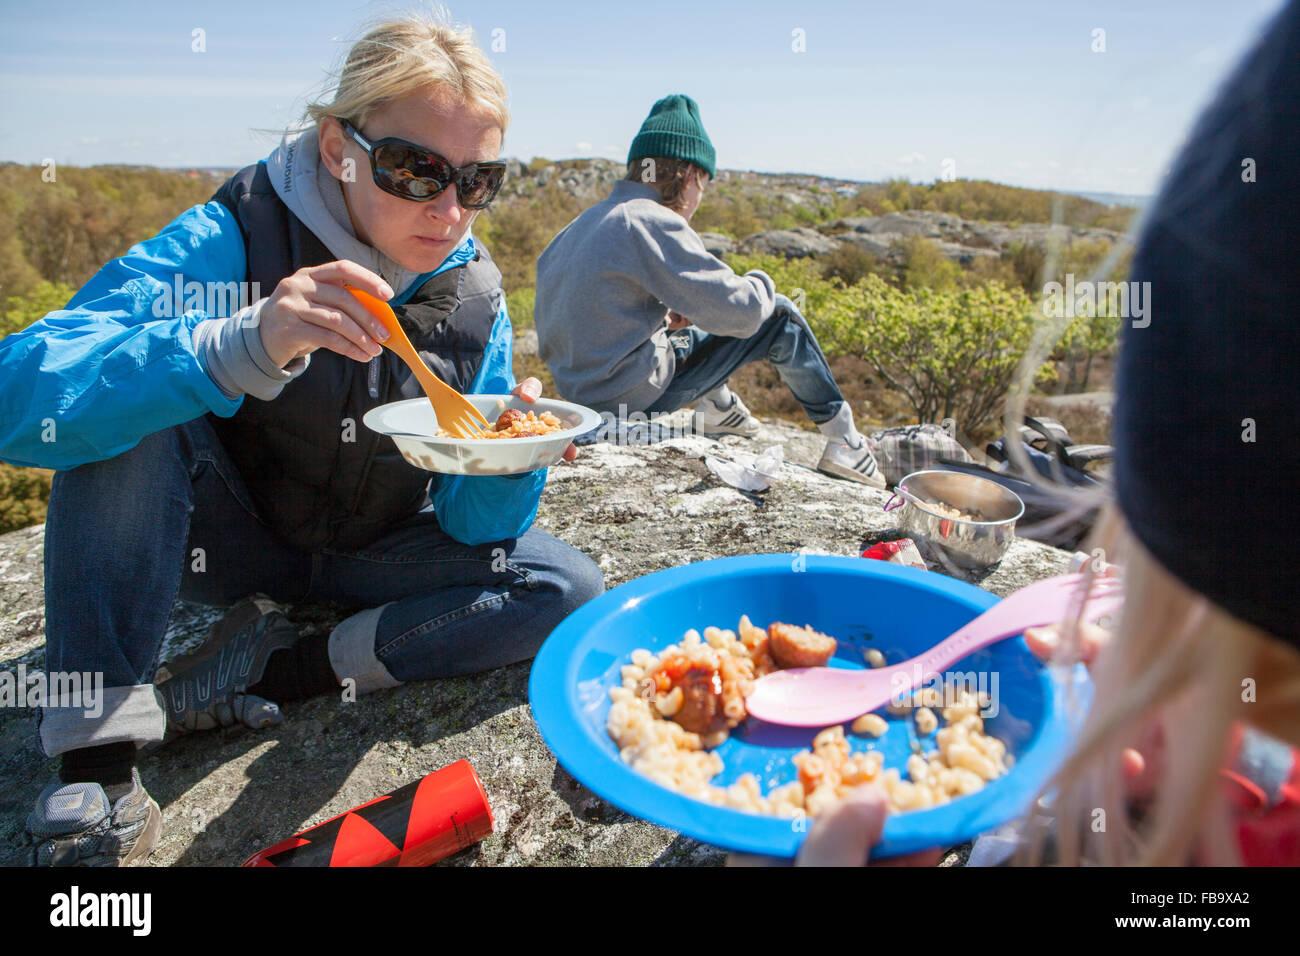 Archipiélago de Gotemburgo, Suecia, Vastergotland, Styrso, mamá y sus dos hijos (8-9, 10-11) comer pasta Imagen De Stock